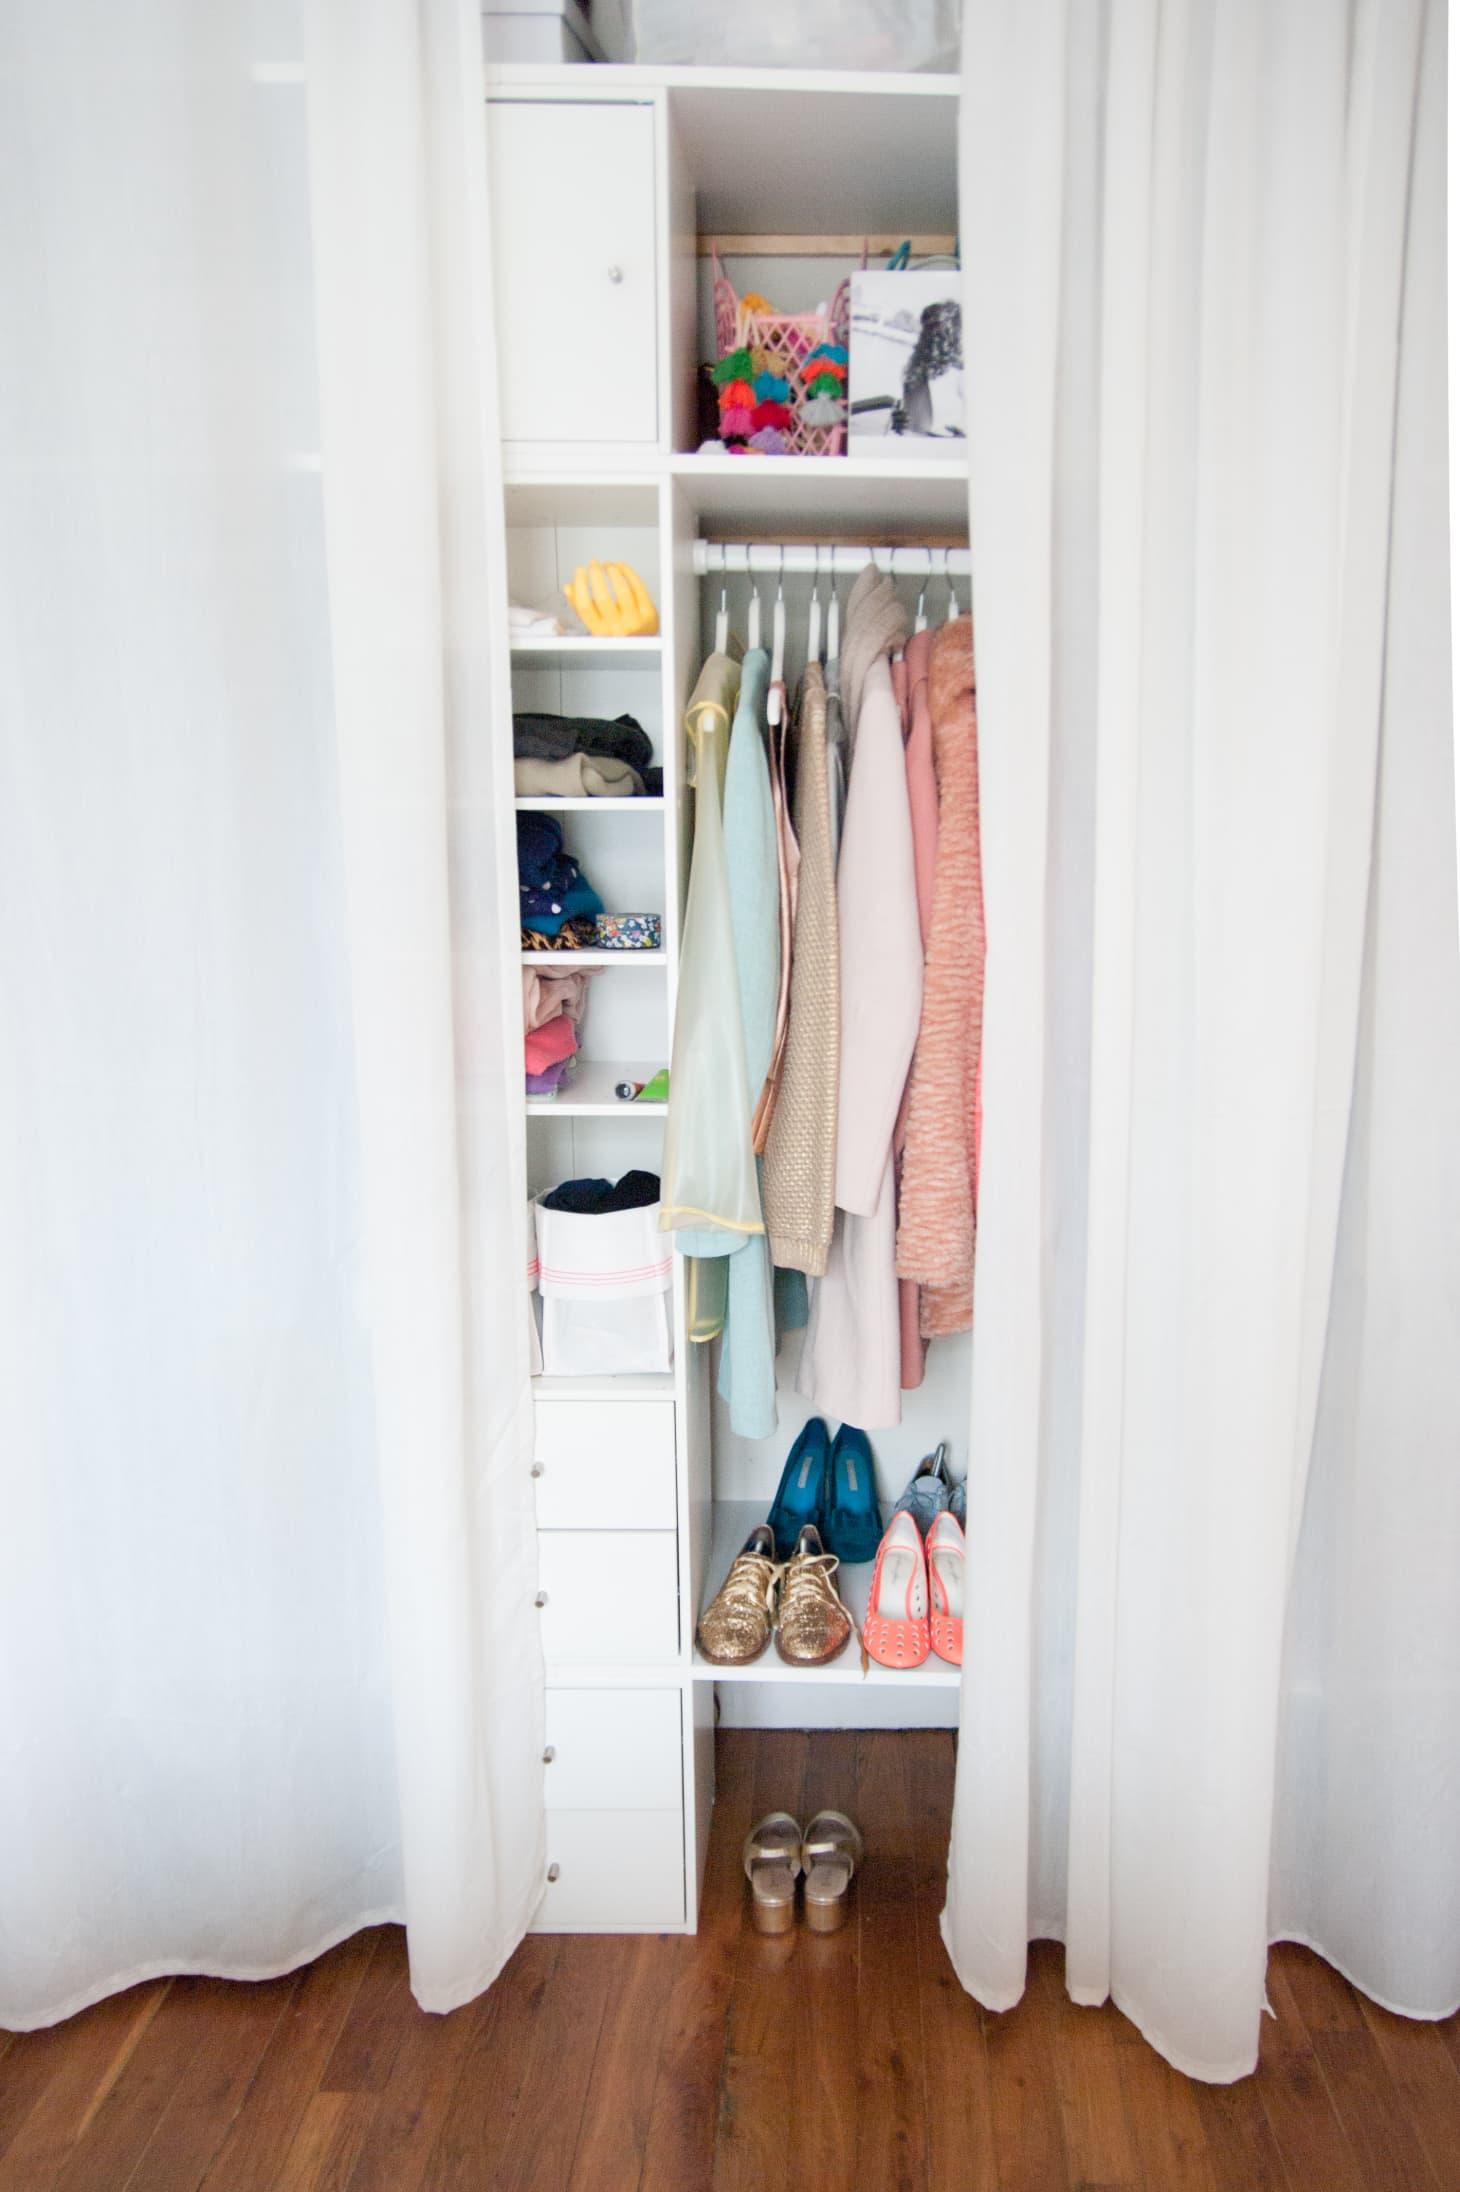 Closet storage ideas small closet organization - Small closet storage ideas ...